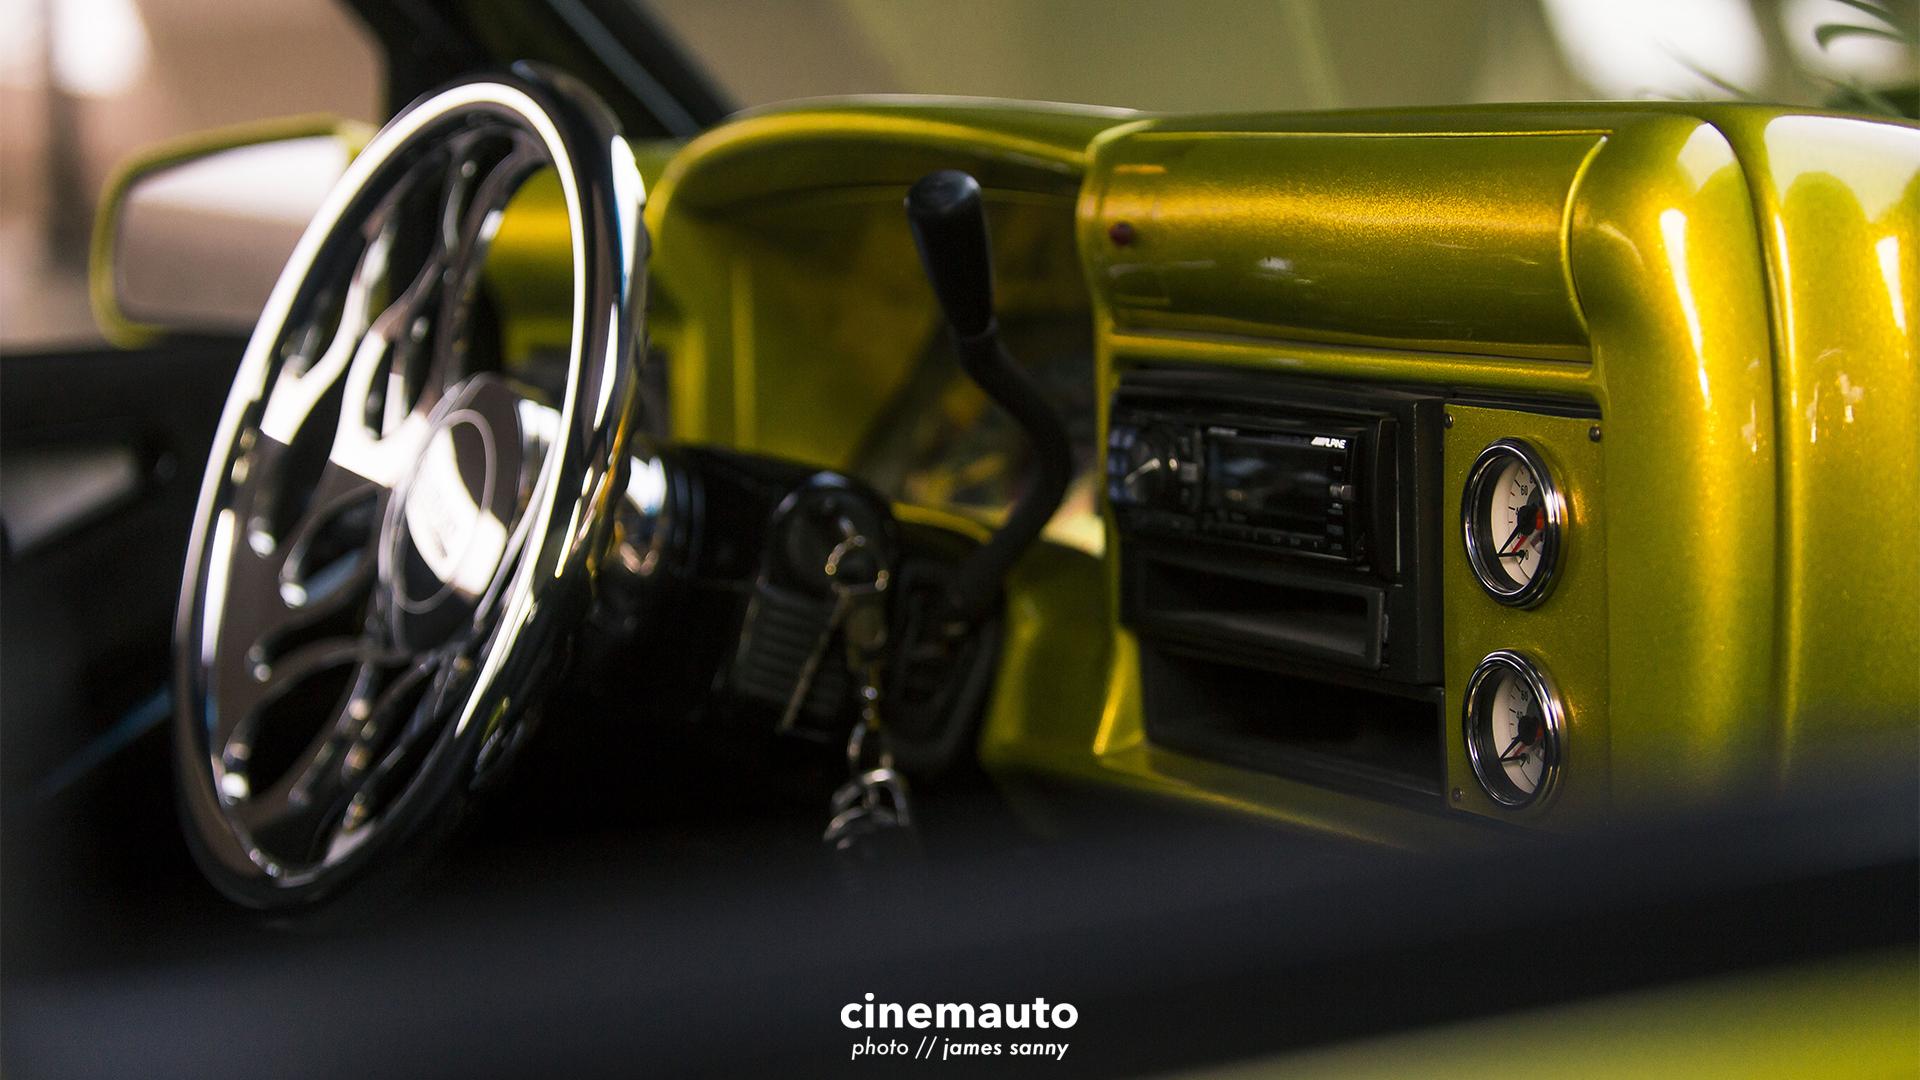 cinemauto-wichita-automotive-photographer-james-sanny-Ksm.jpg